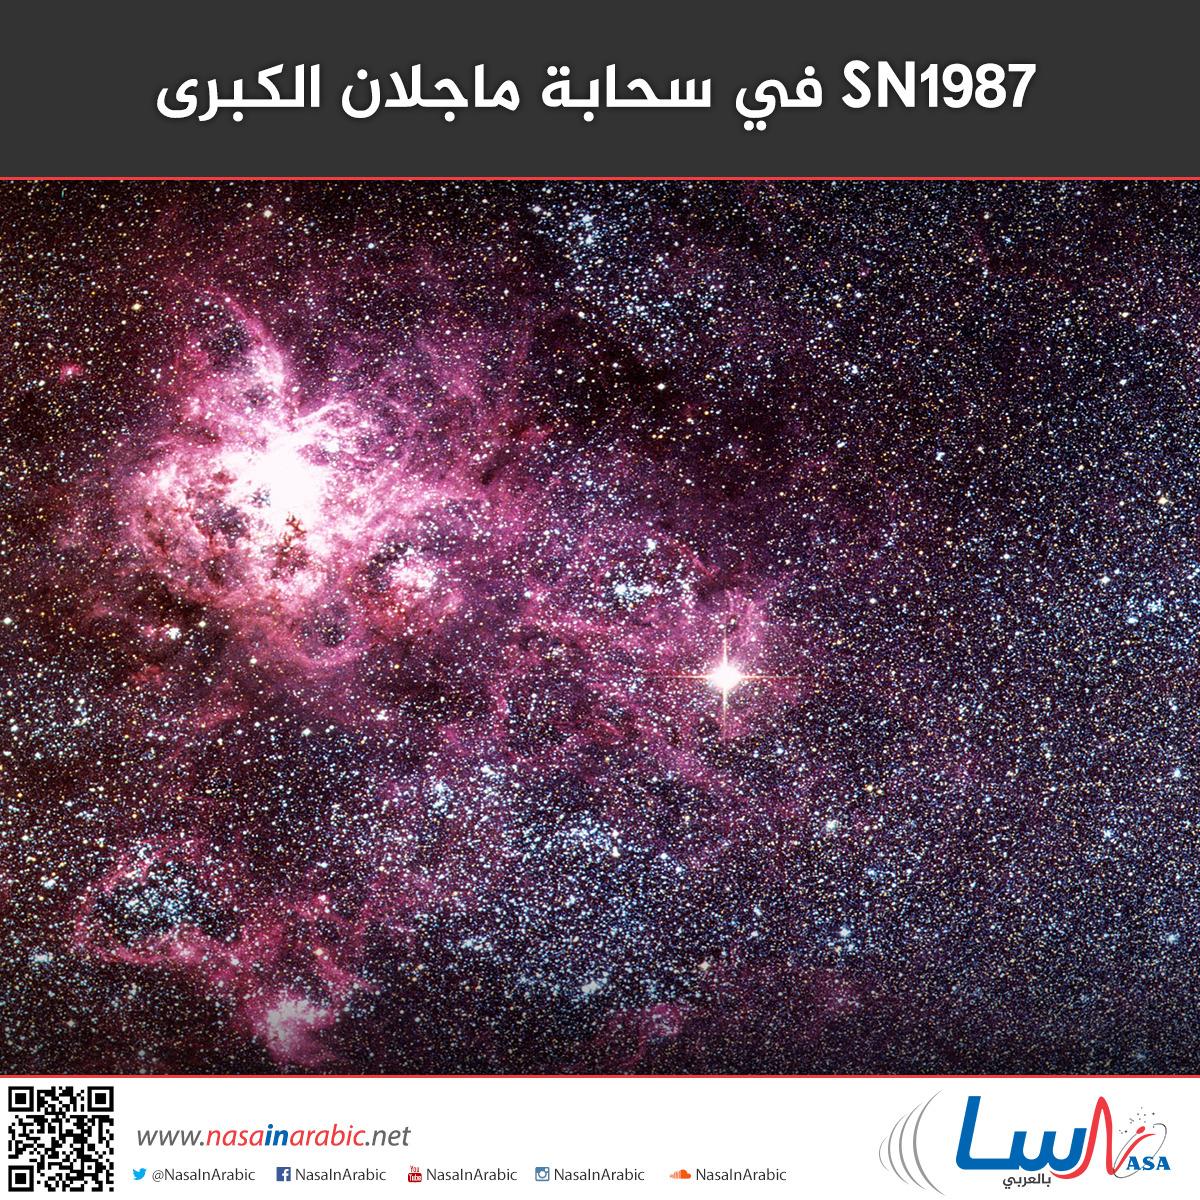 SN1987 في سحابة ماجلان الكبرى